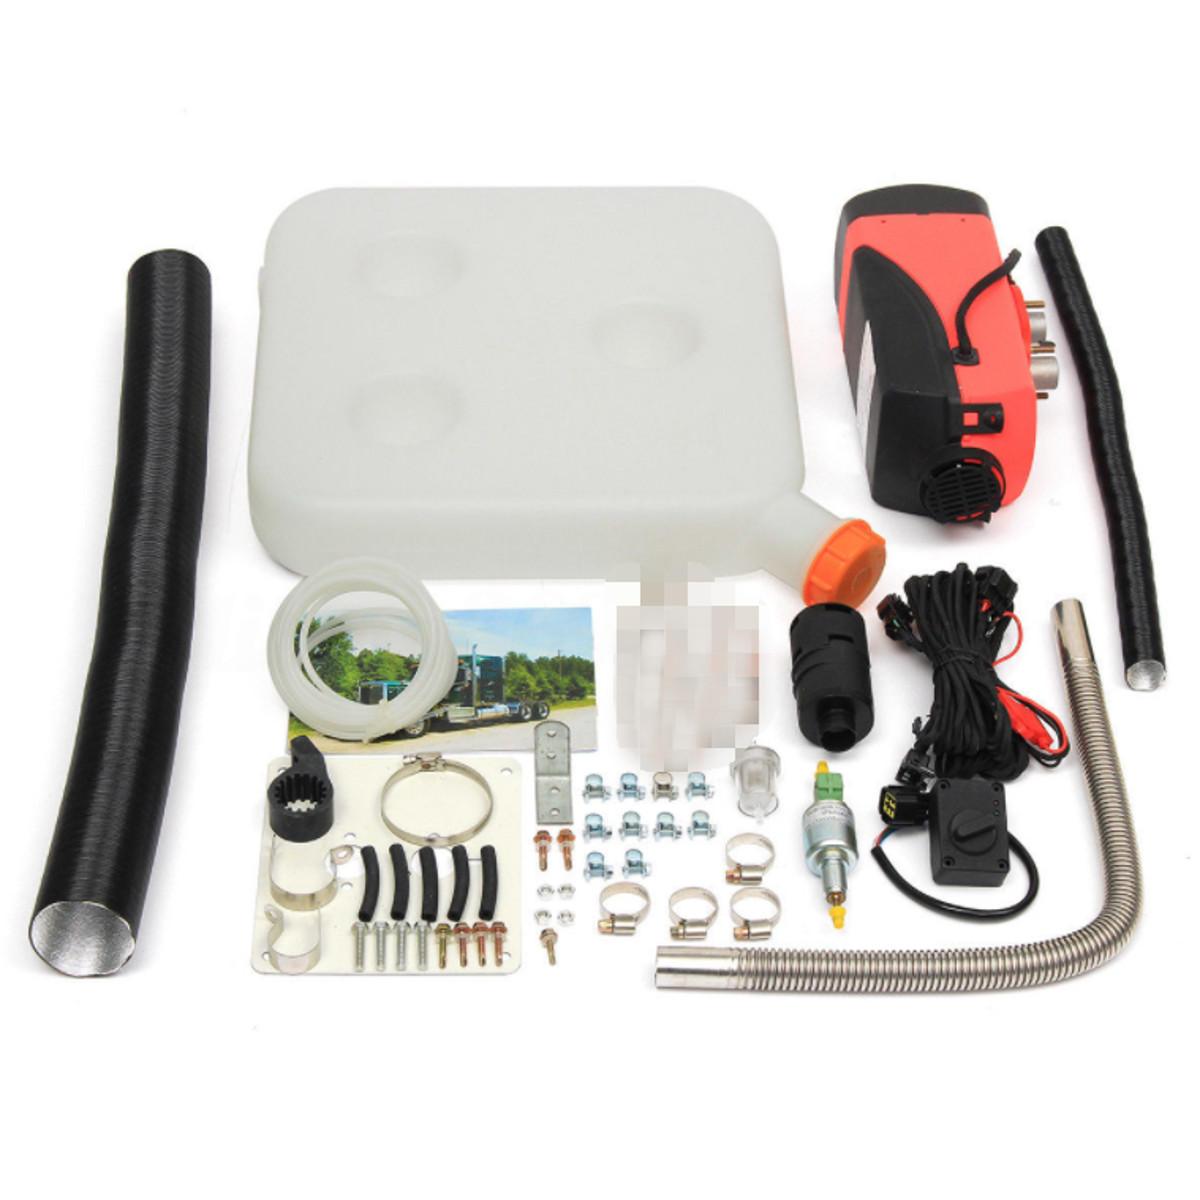 hight resolution of 24v 12v 2kw 5kw diesel air parking heater diesel heating parking air heater cod